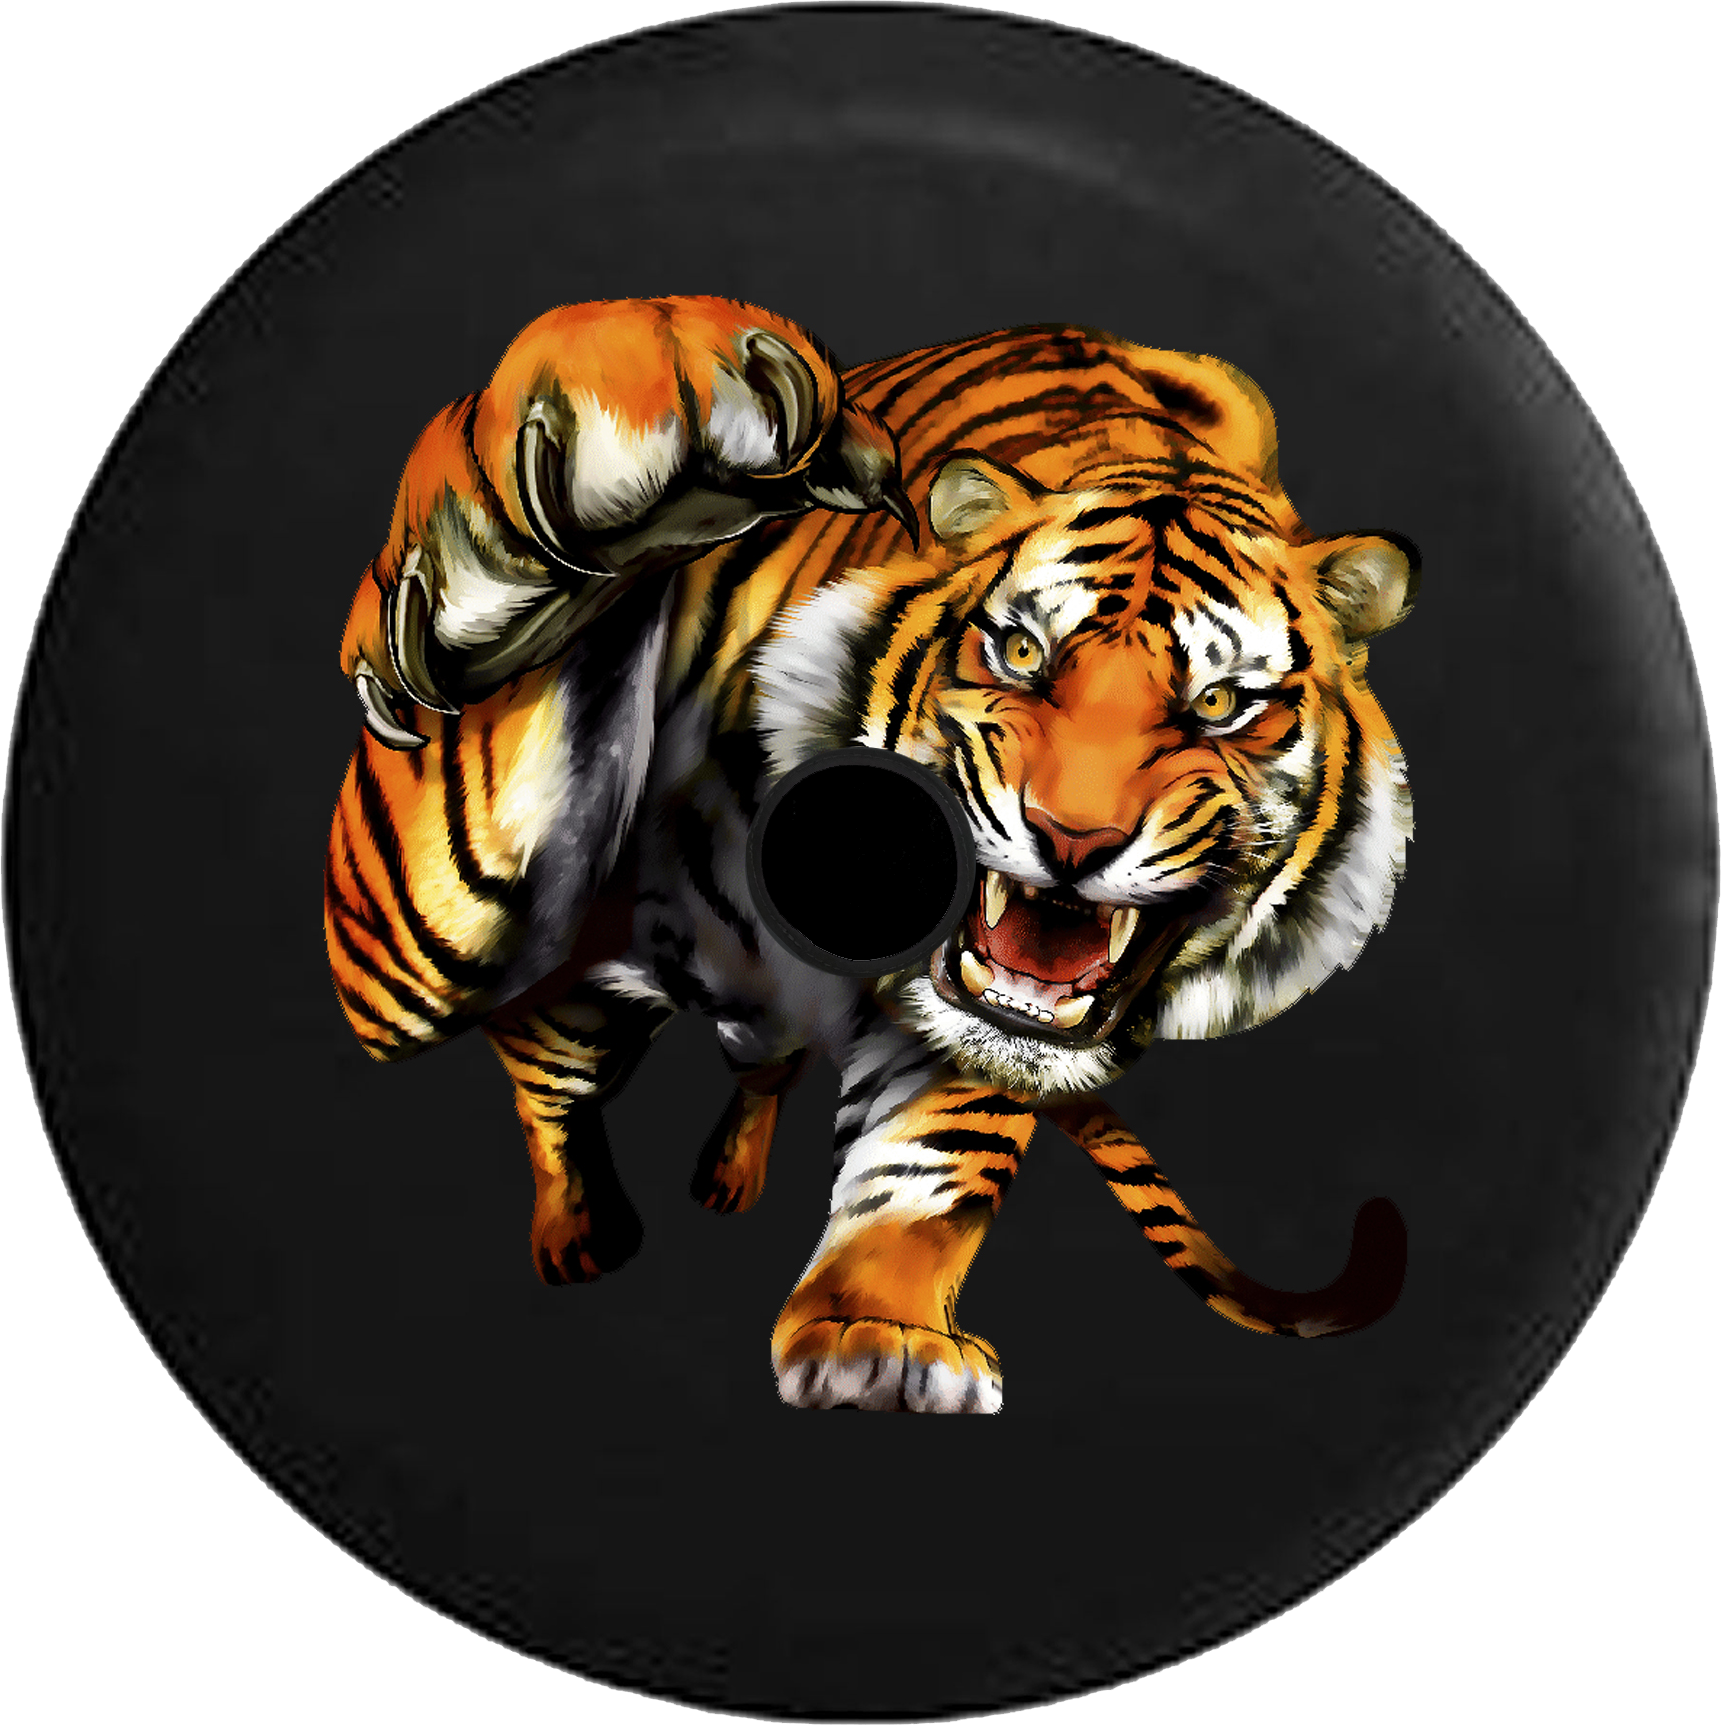 Jeep Wrangler Jl Backup Camera Day Striped Tiger Attacking.